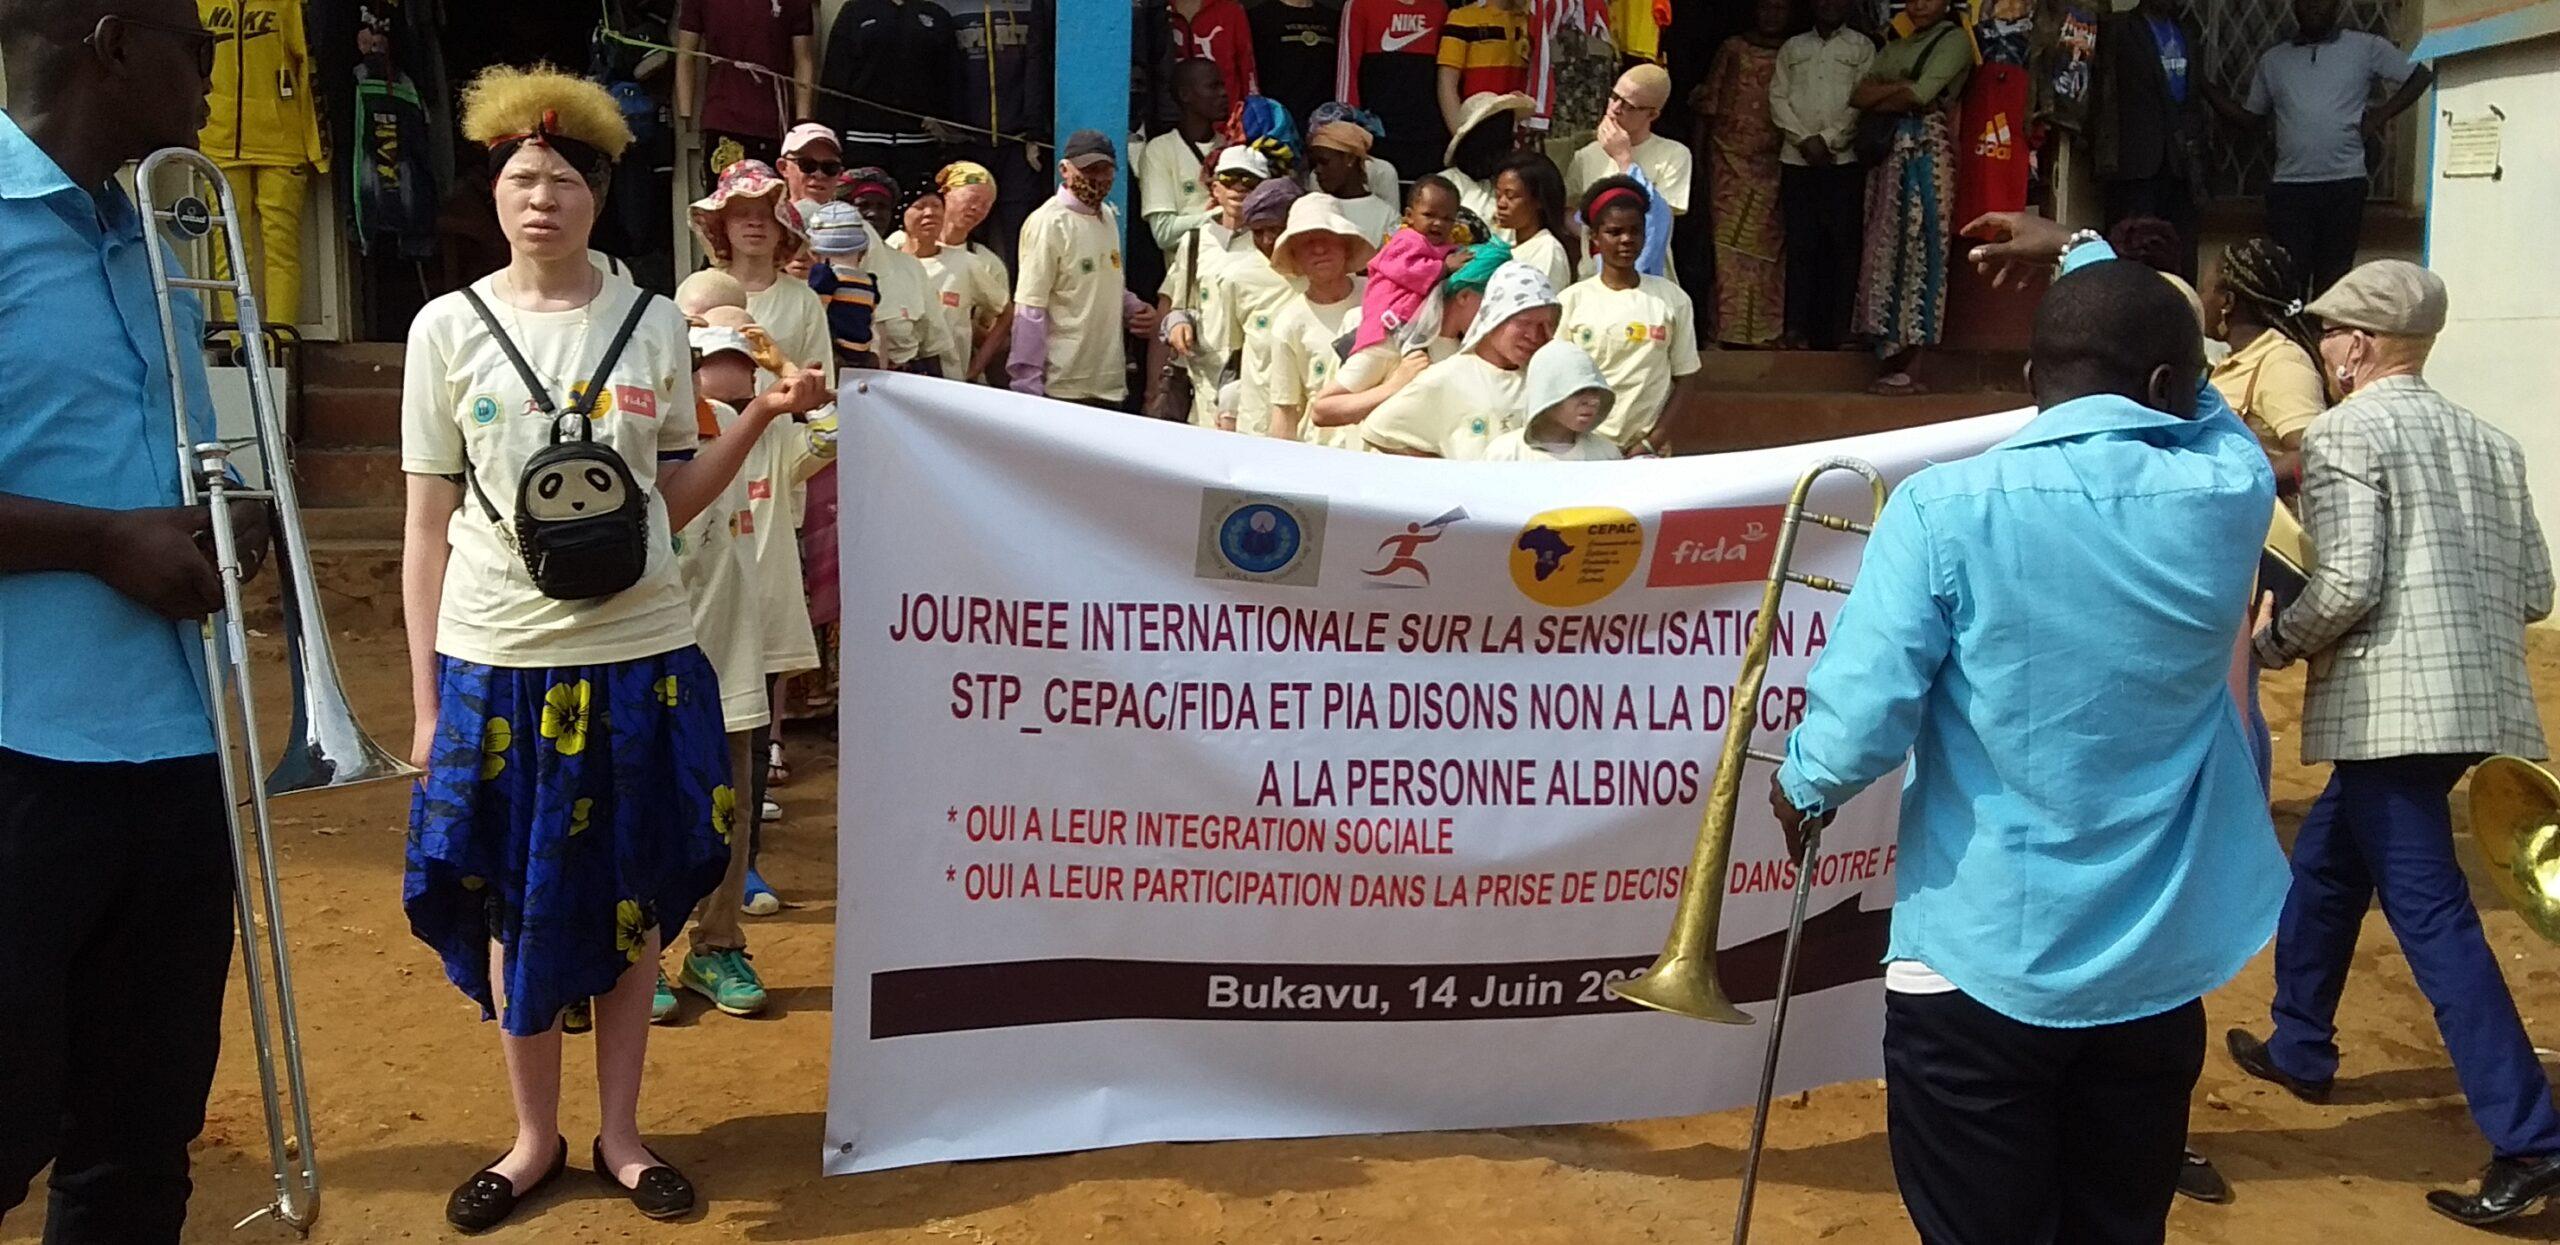 Sud-kivu : 29 albinos tués et 14 tombes profanées depuis 2010.